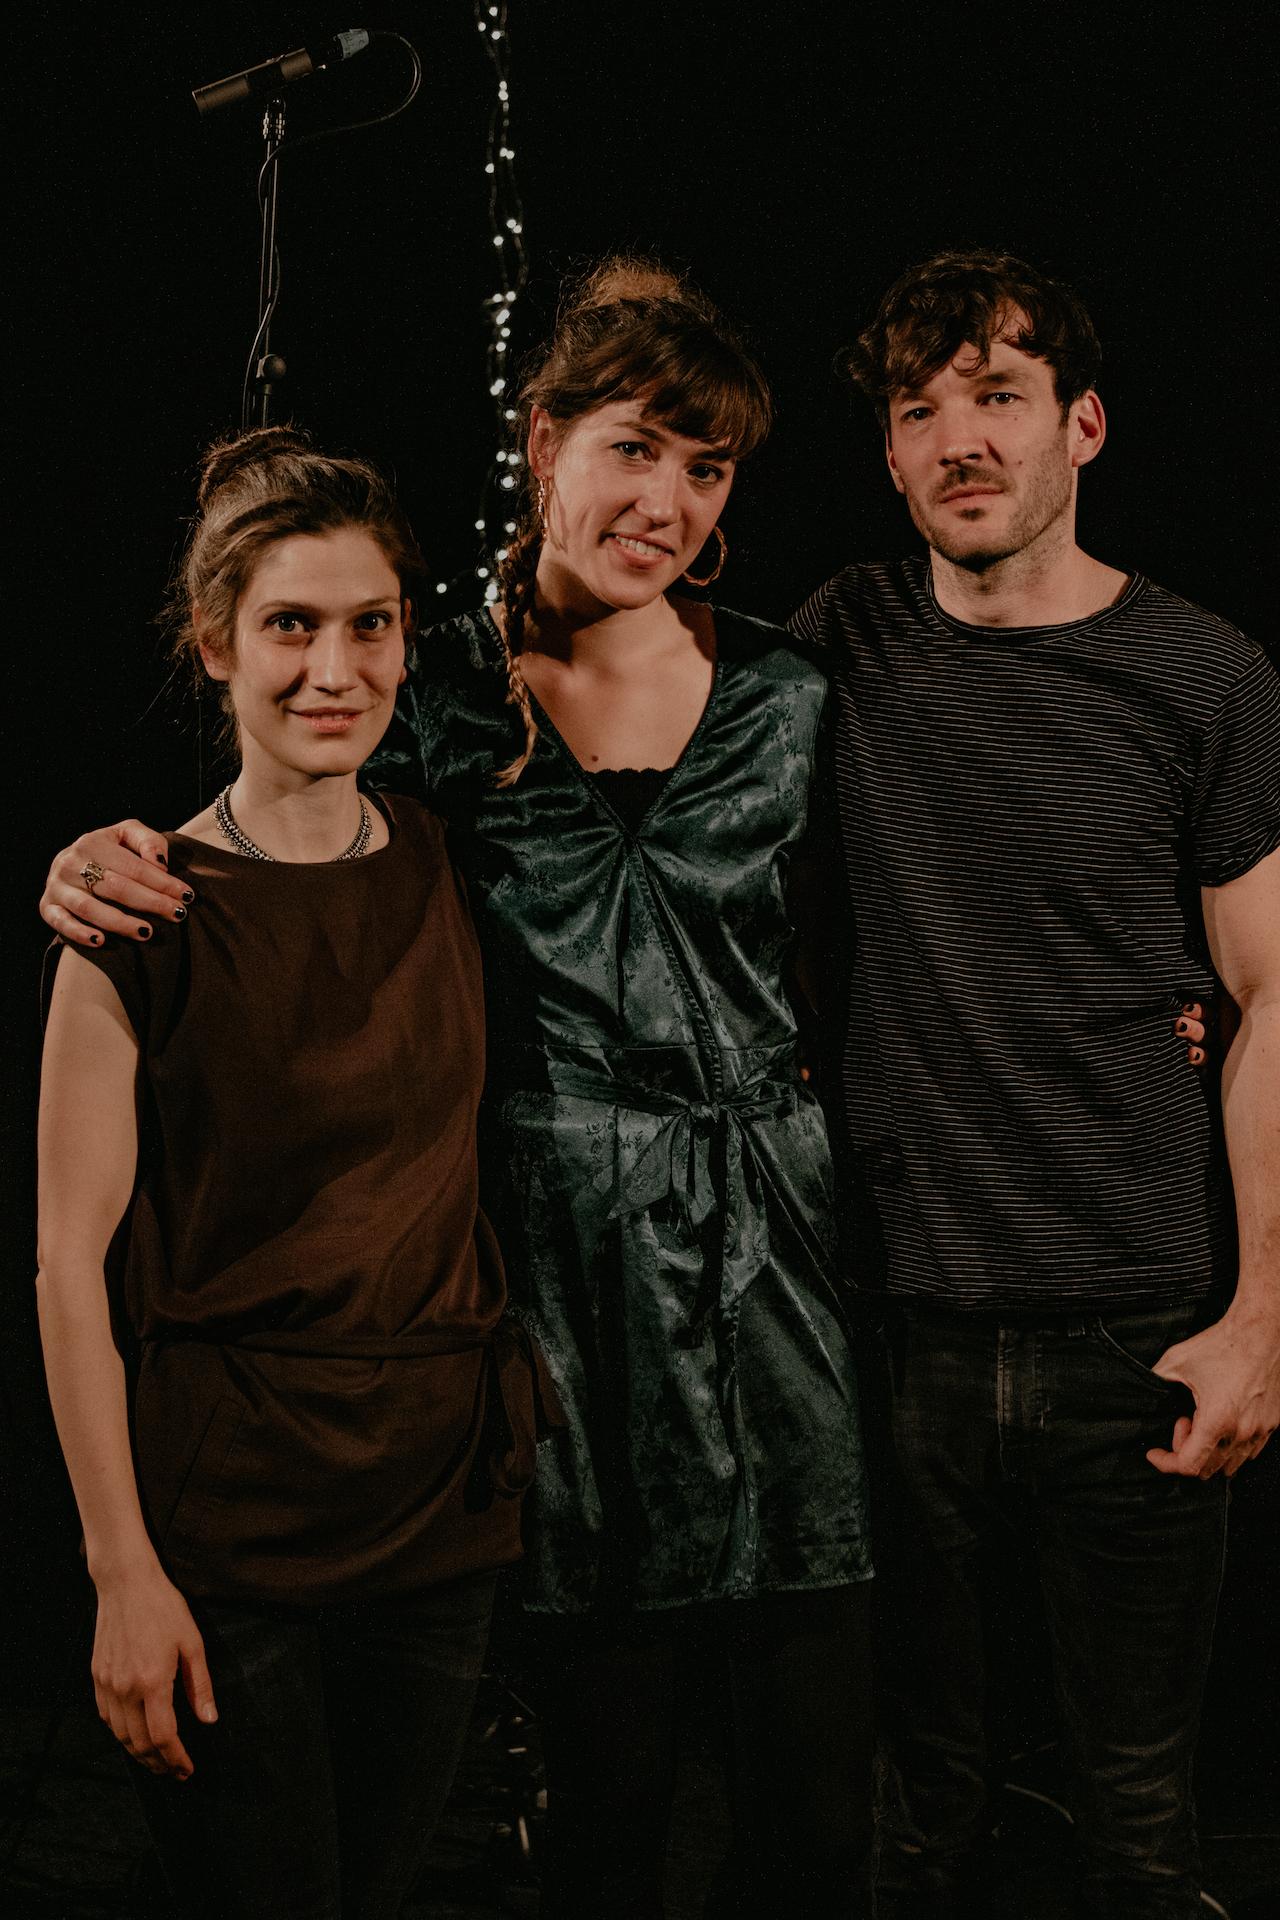 Johanna Amelie (Mitte) bei Fritz Unsigned mit Alin Coen (links) und Fabian Stevens (rechts)